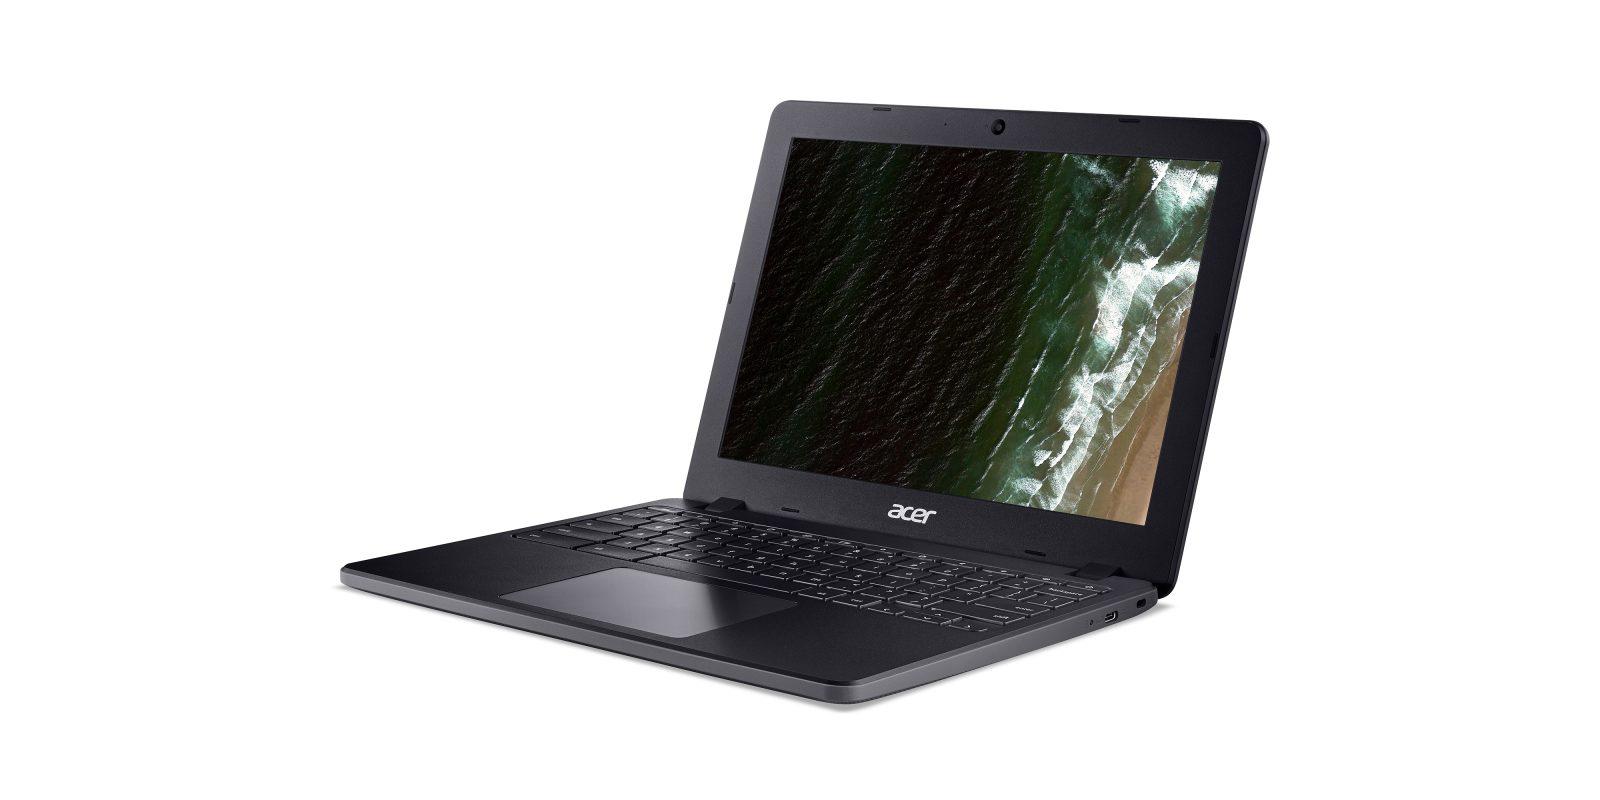 Acer Chromebook 712 brings 3:2 display, 10th-Gen Intel from $329